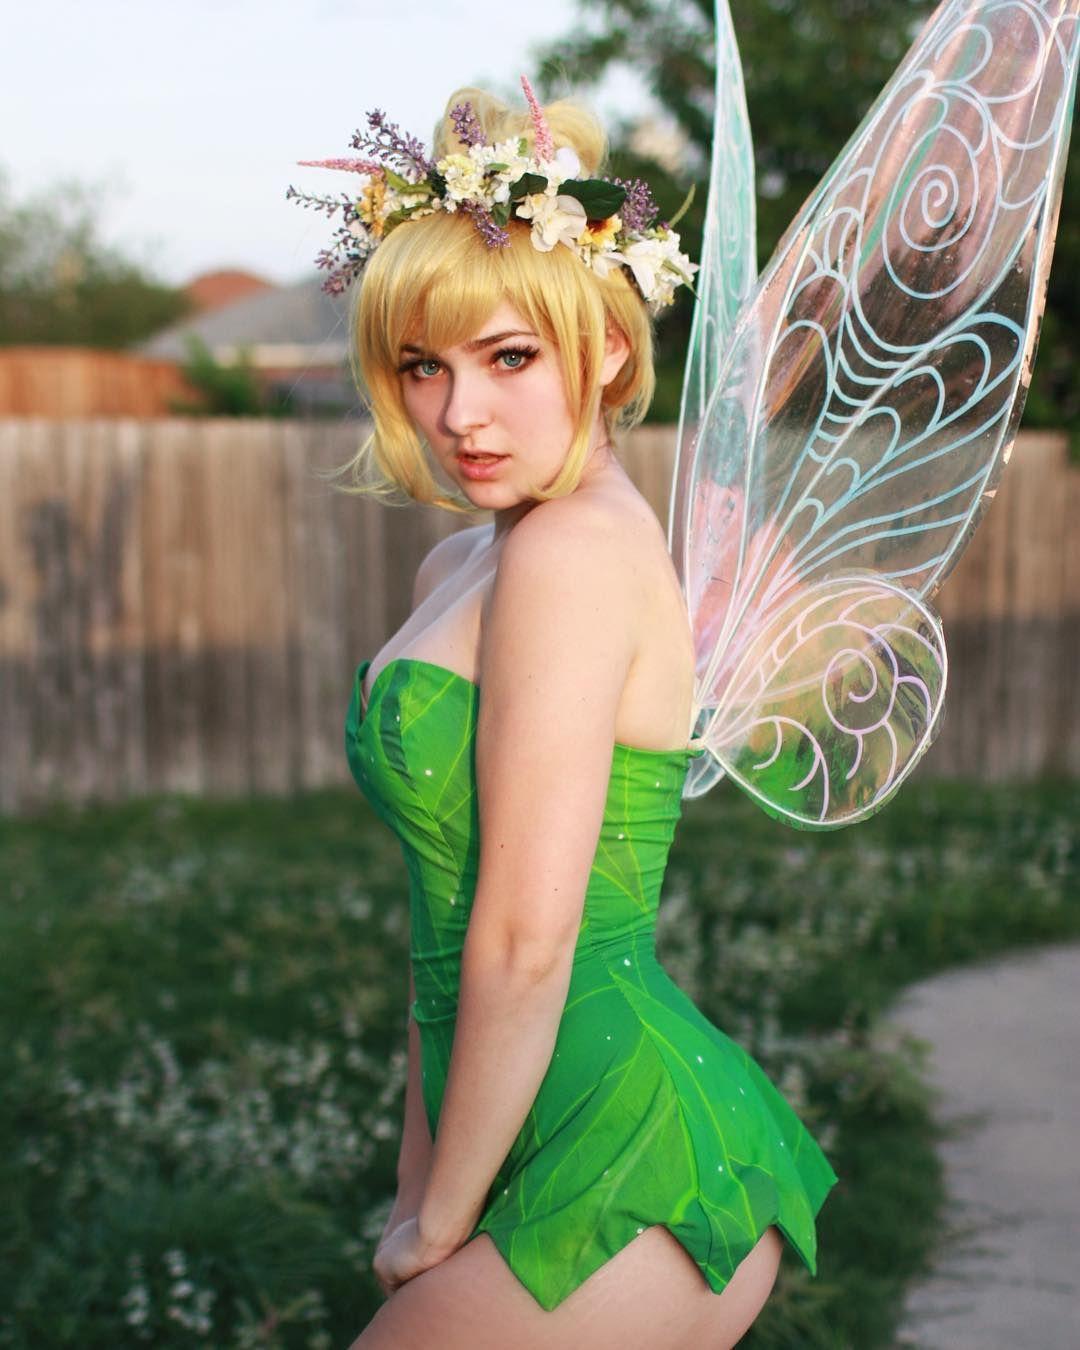 OMGcosplay - Tinker Bell - Cosplay - Peter Pan   Tinker Bell ...